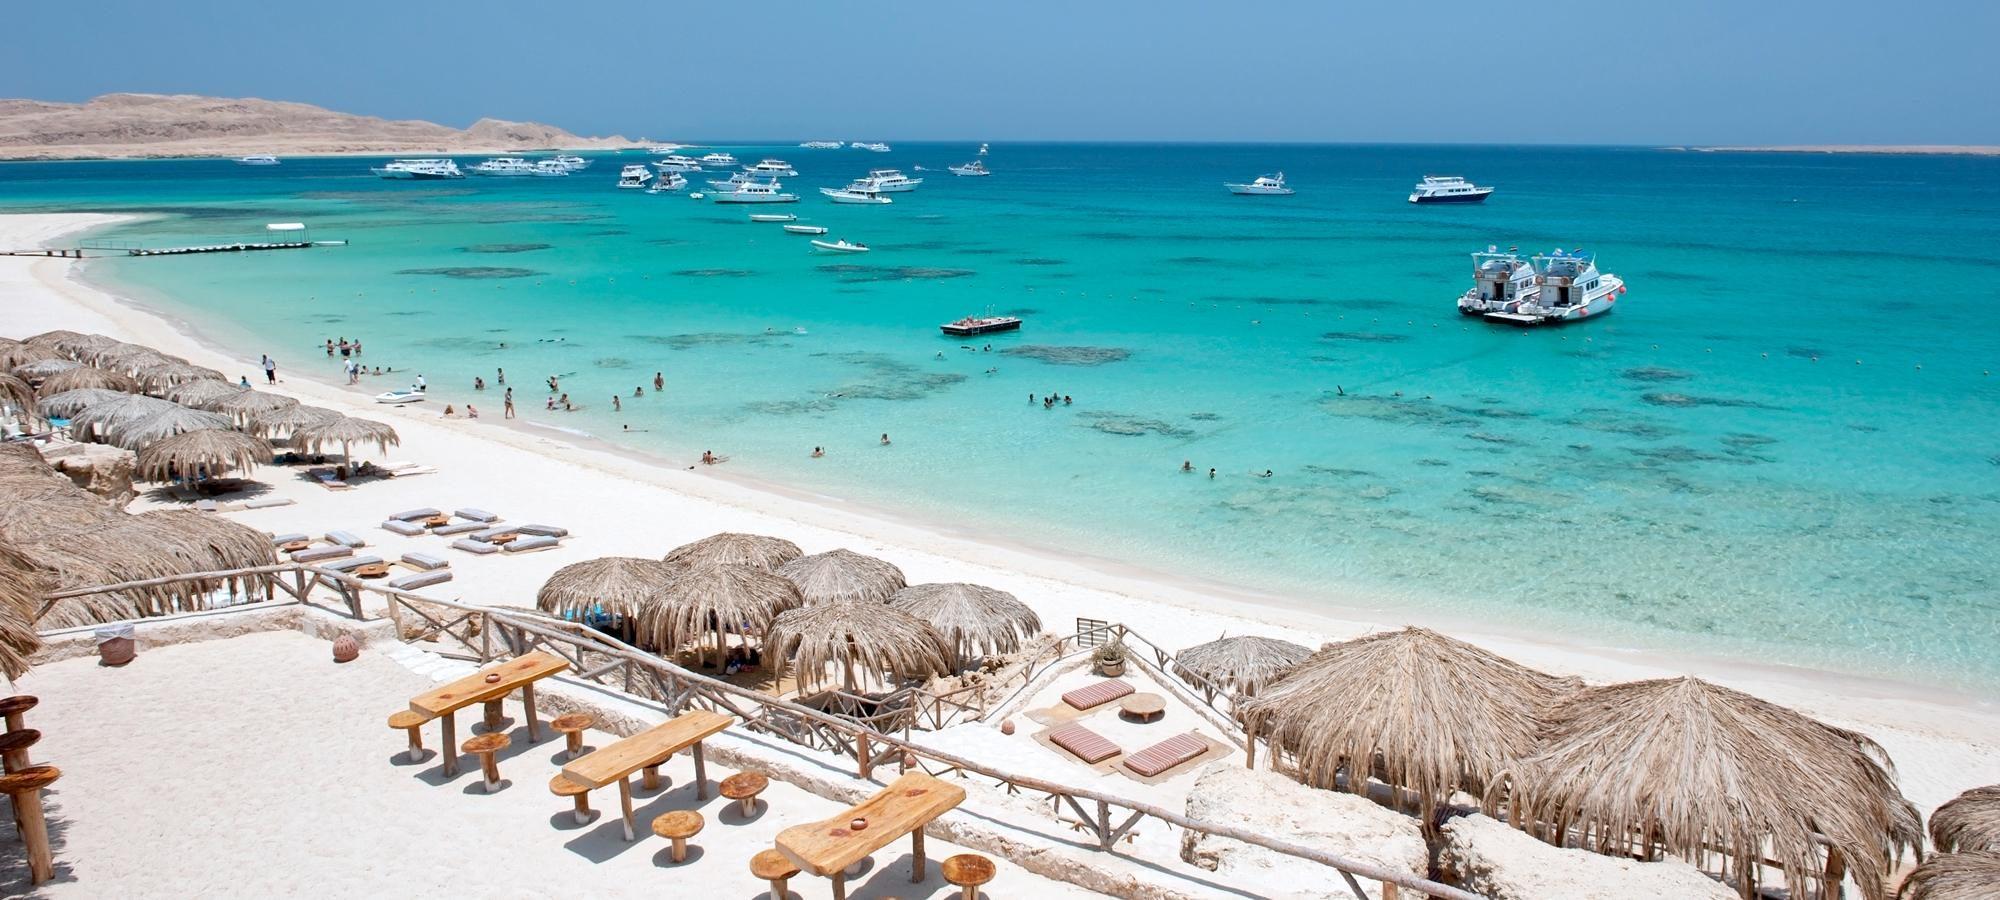 Mahmya Island, Hurghada